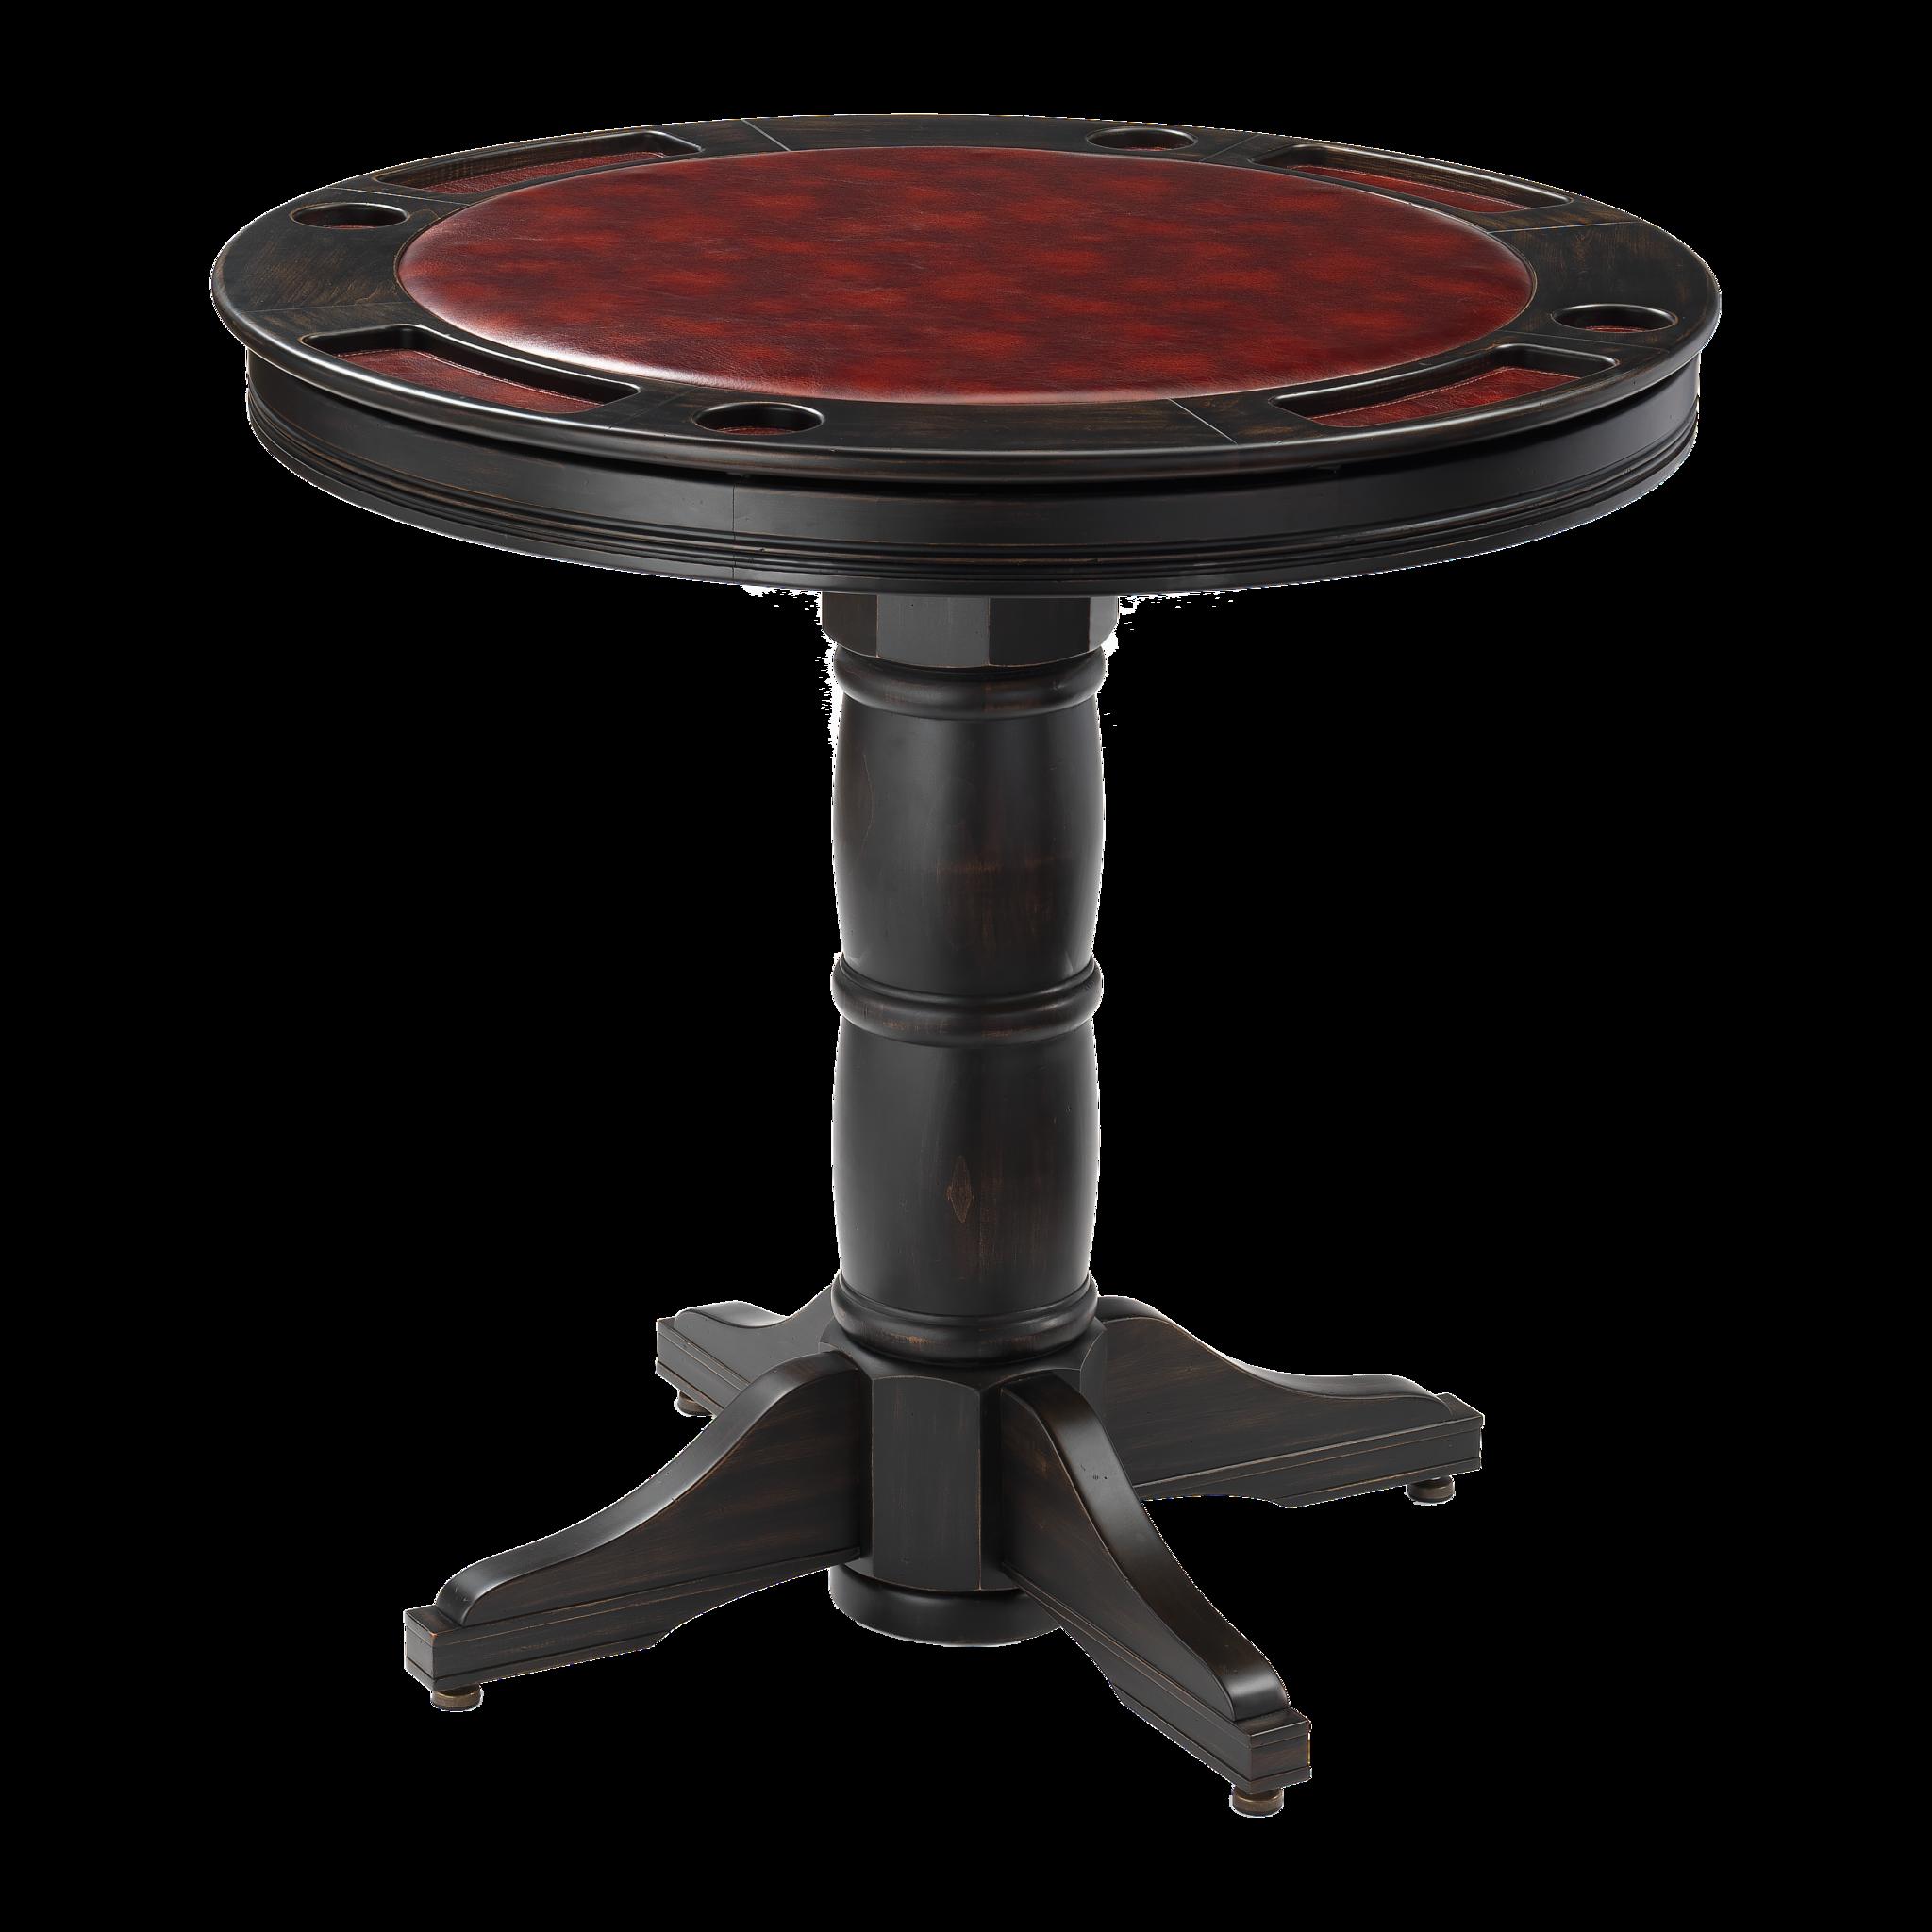 convertible poker dining table balboa by darafeev convertible rh pinterest com